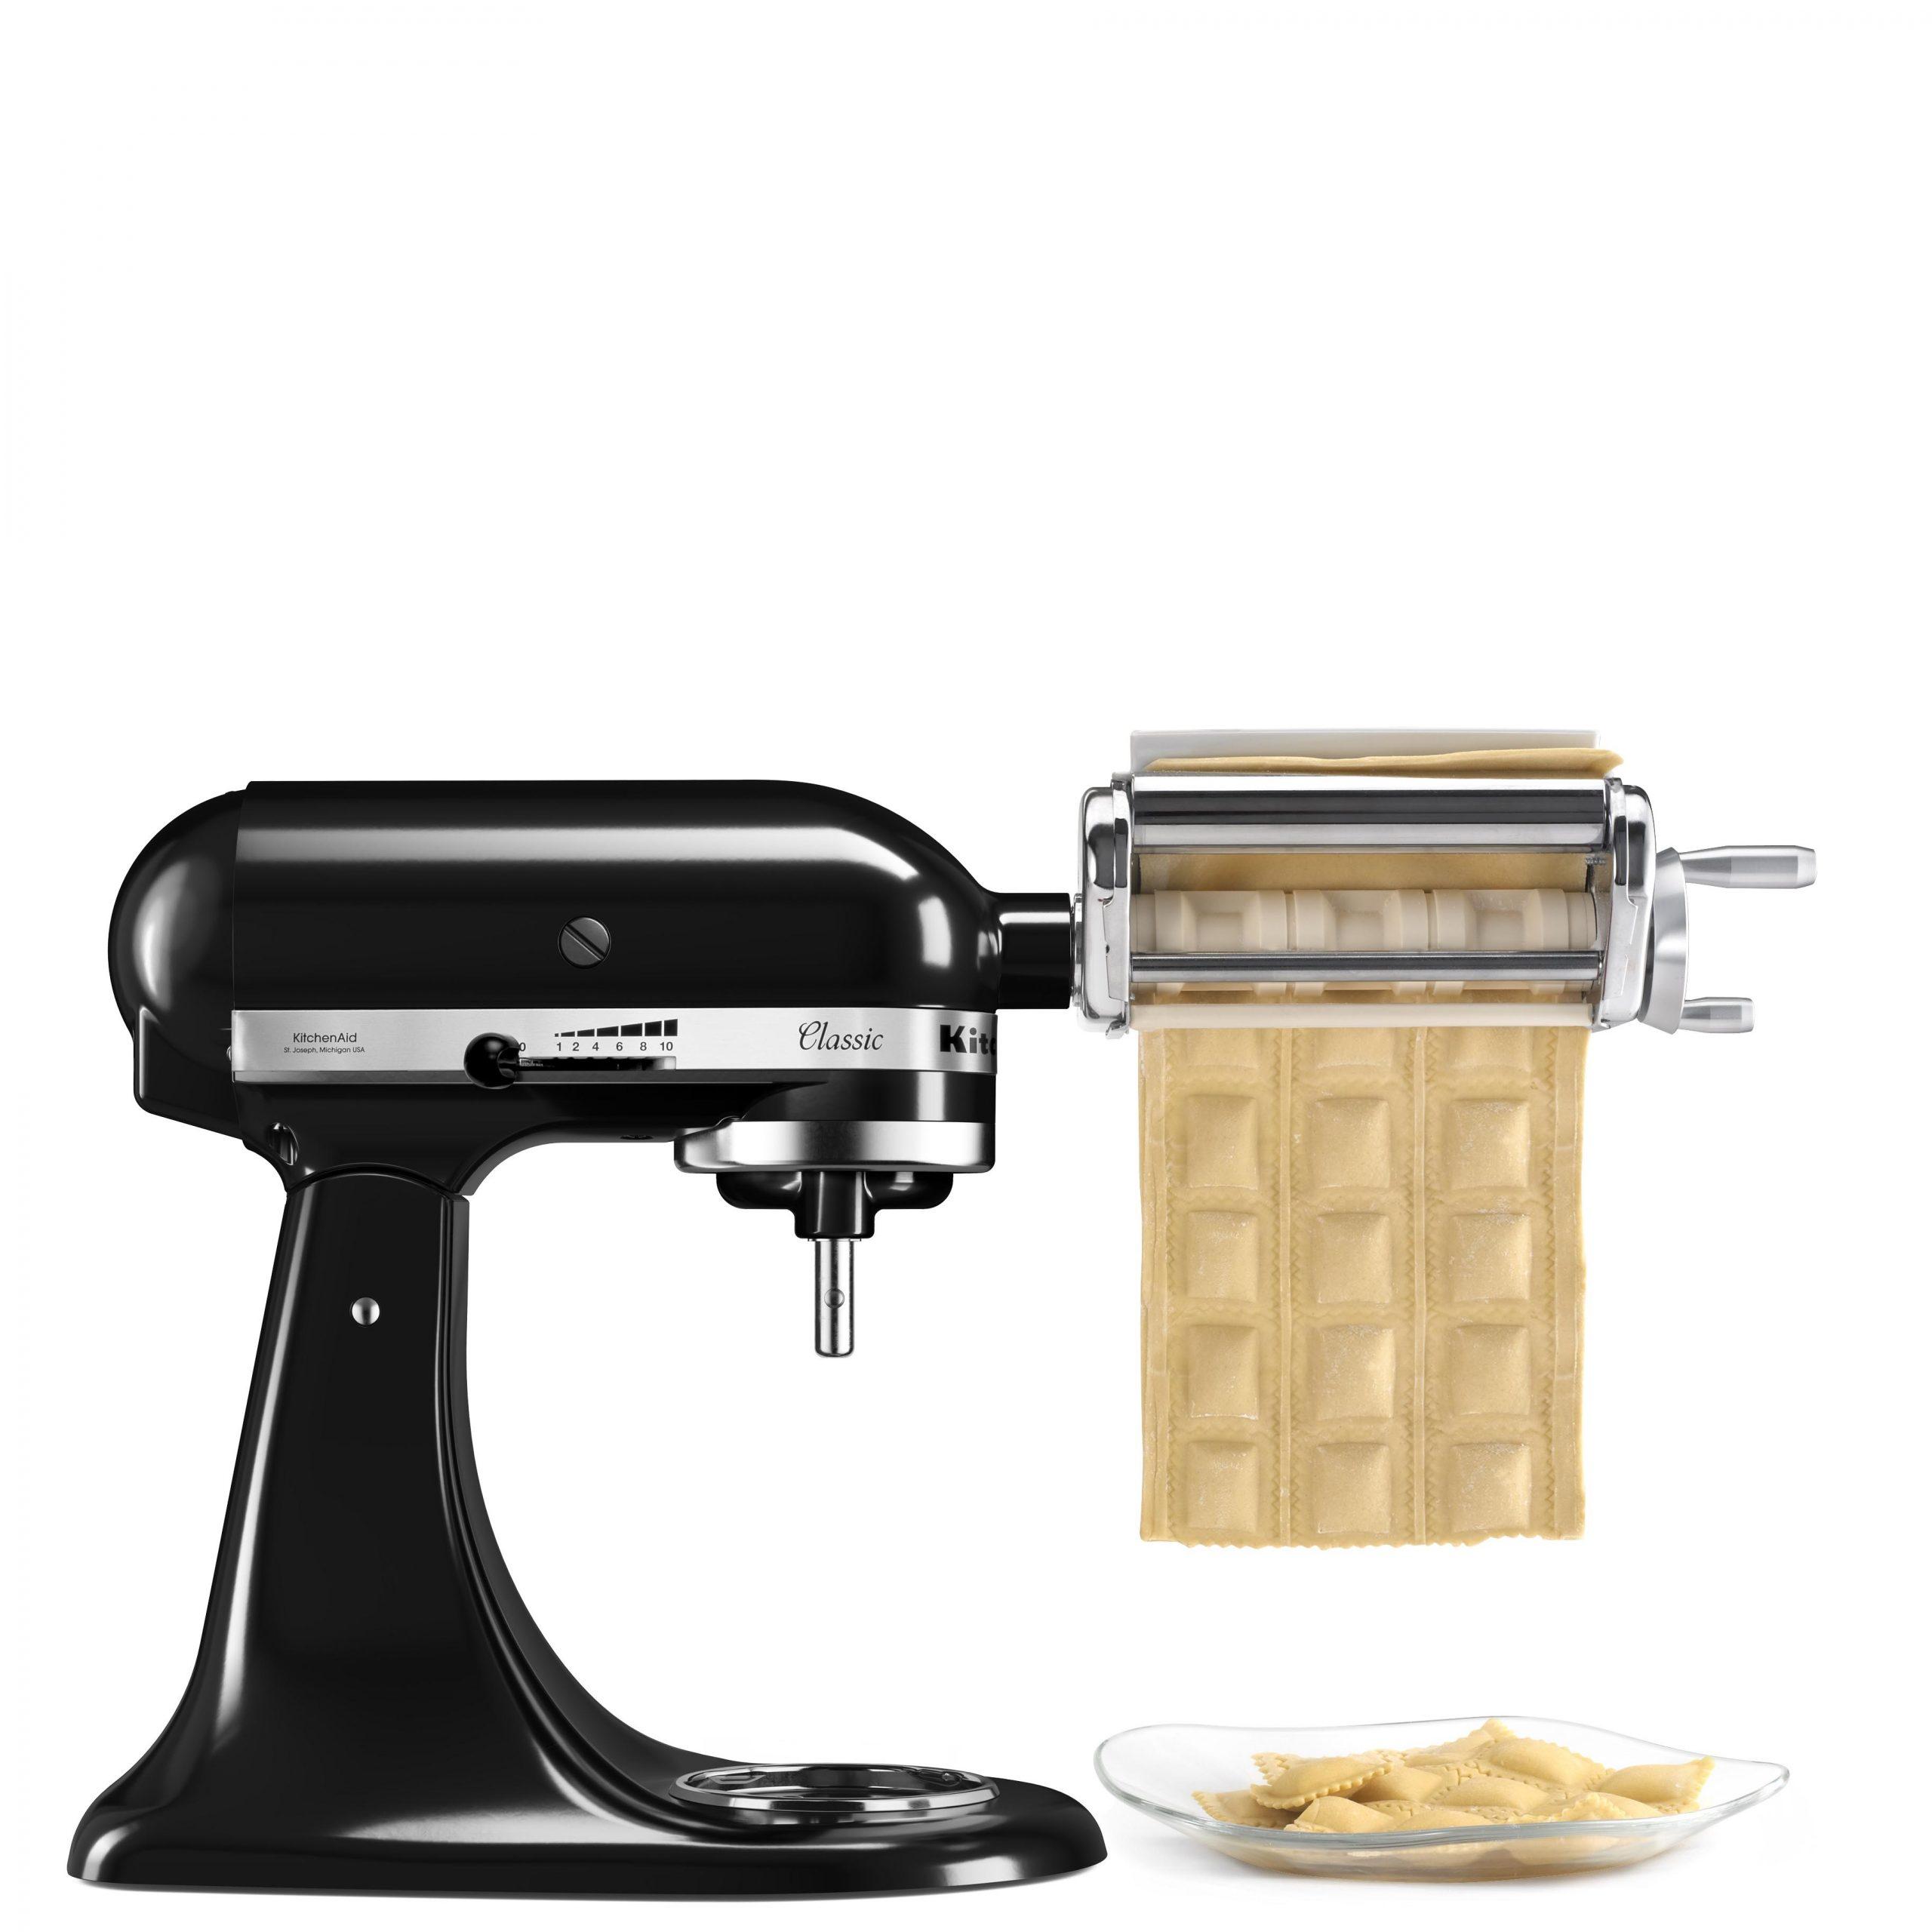 Kitchenaid Ravioli Roller Attachment Chef S Complements